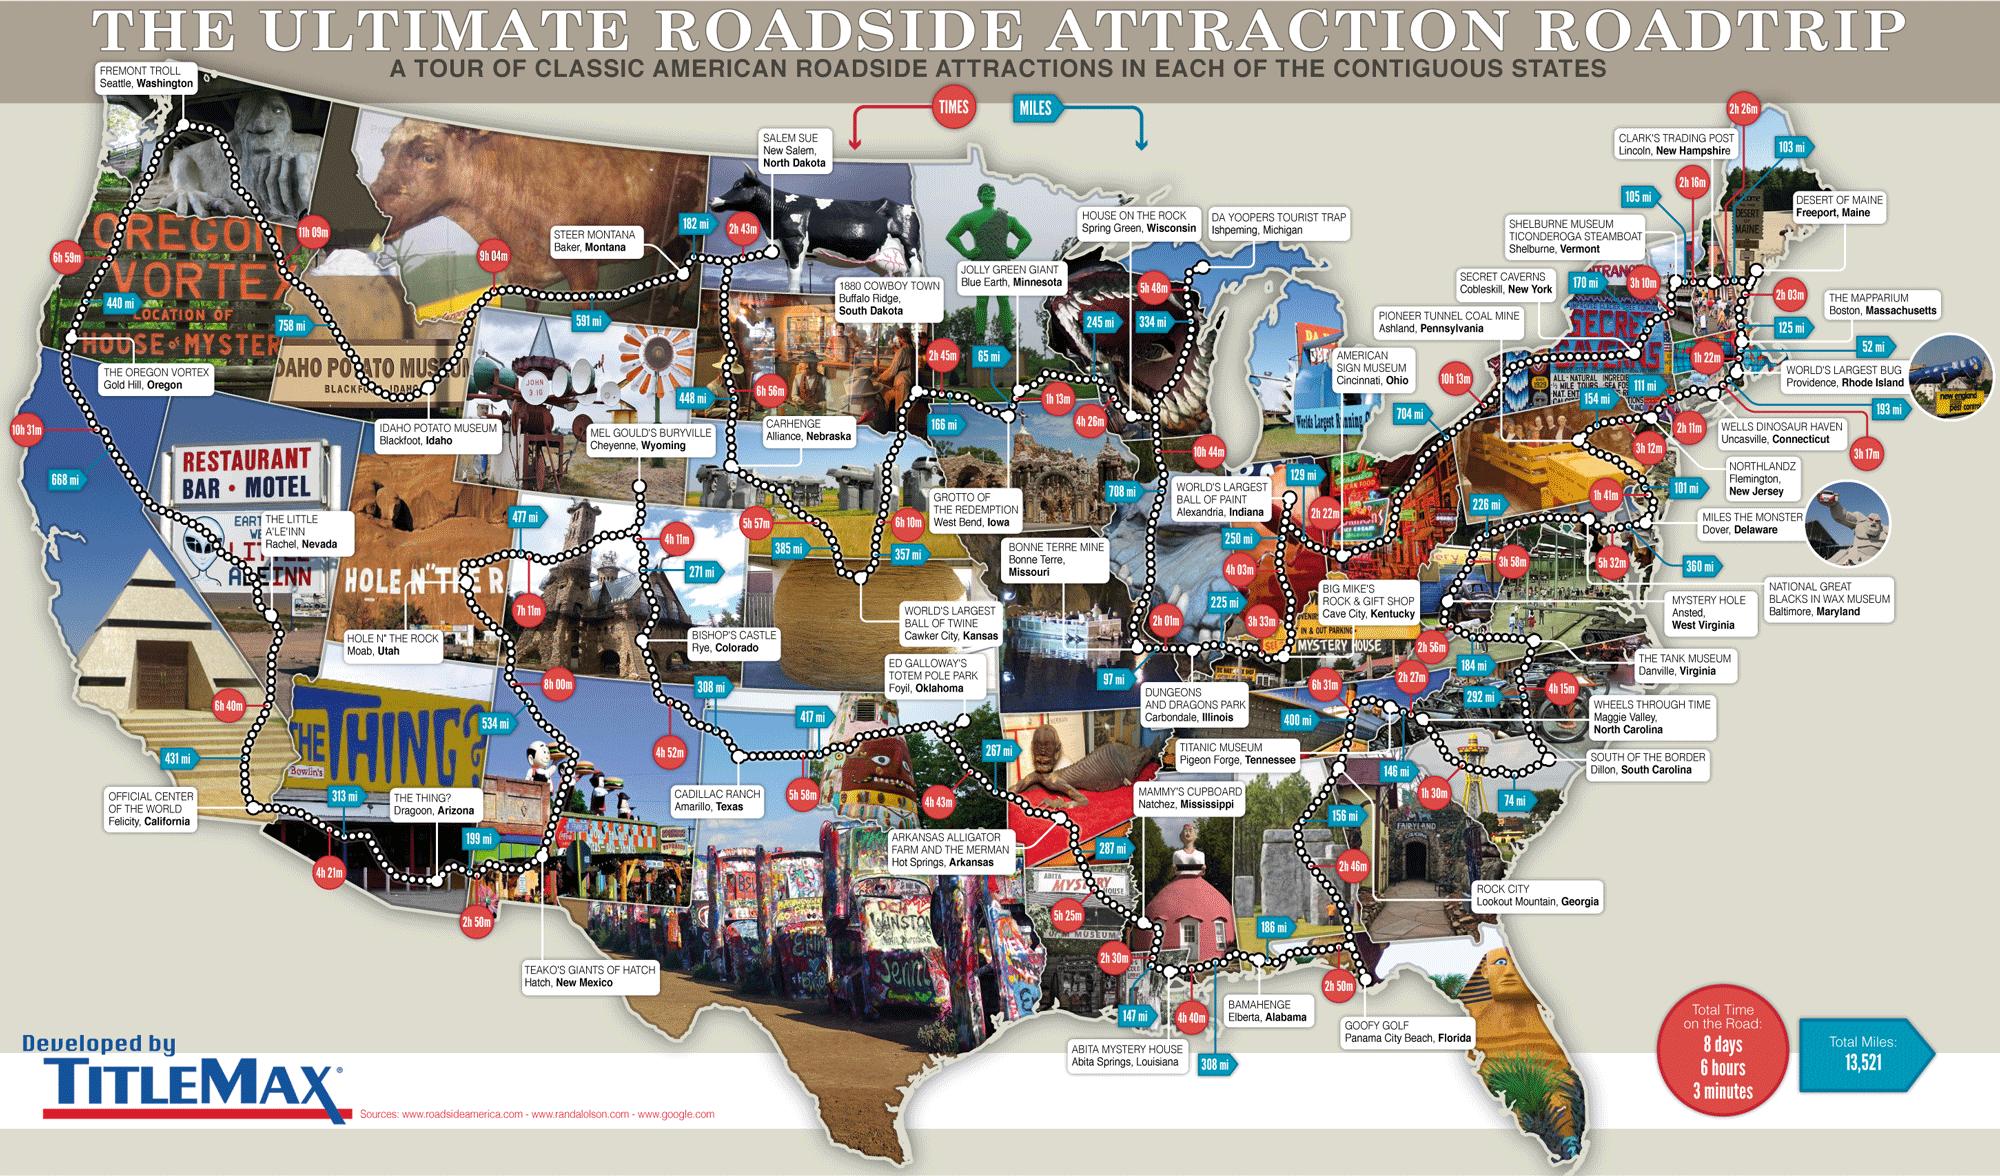 Ultimate Roadside Attraction Roadtrip